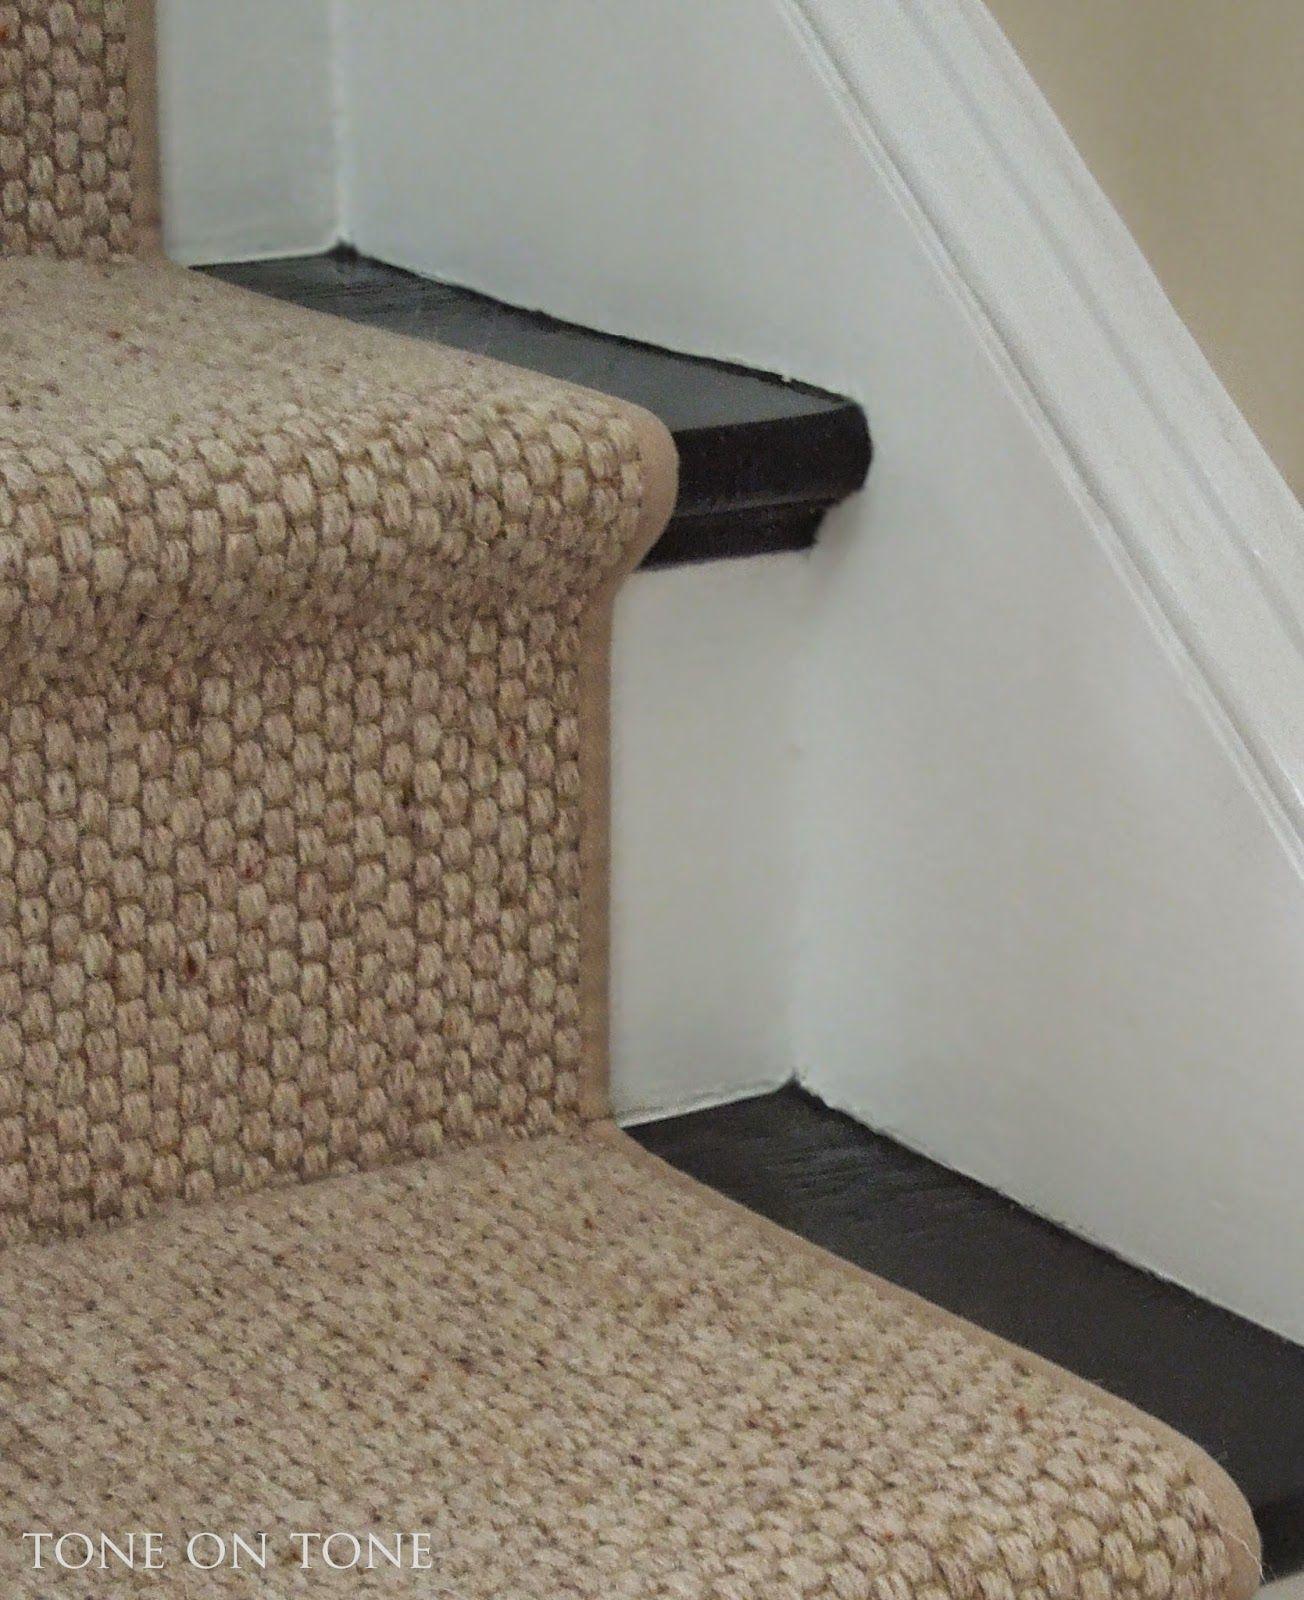 Hallway stair carpet ideas  Tone on Tone A Living Room Project  Hallway Inspo  Pinterest